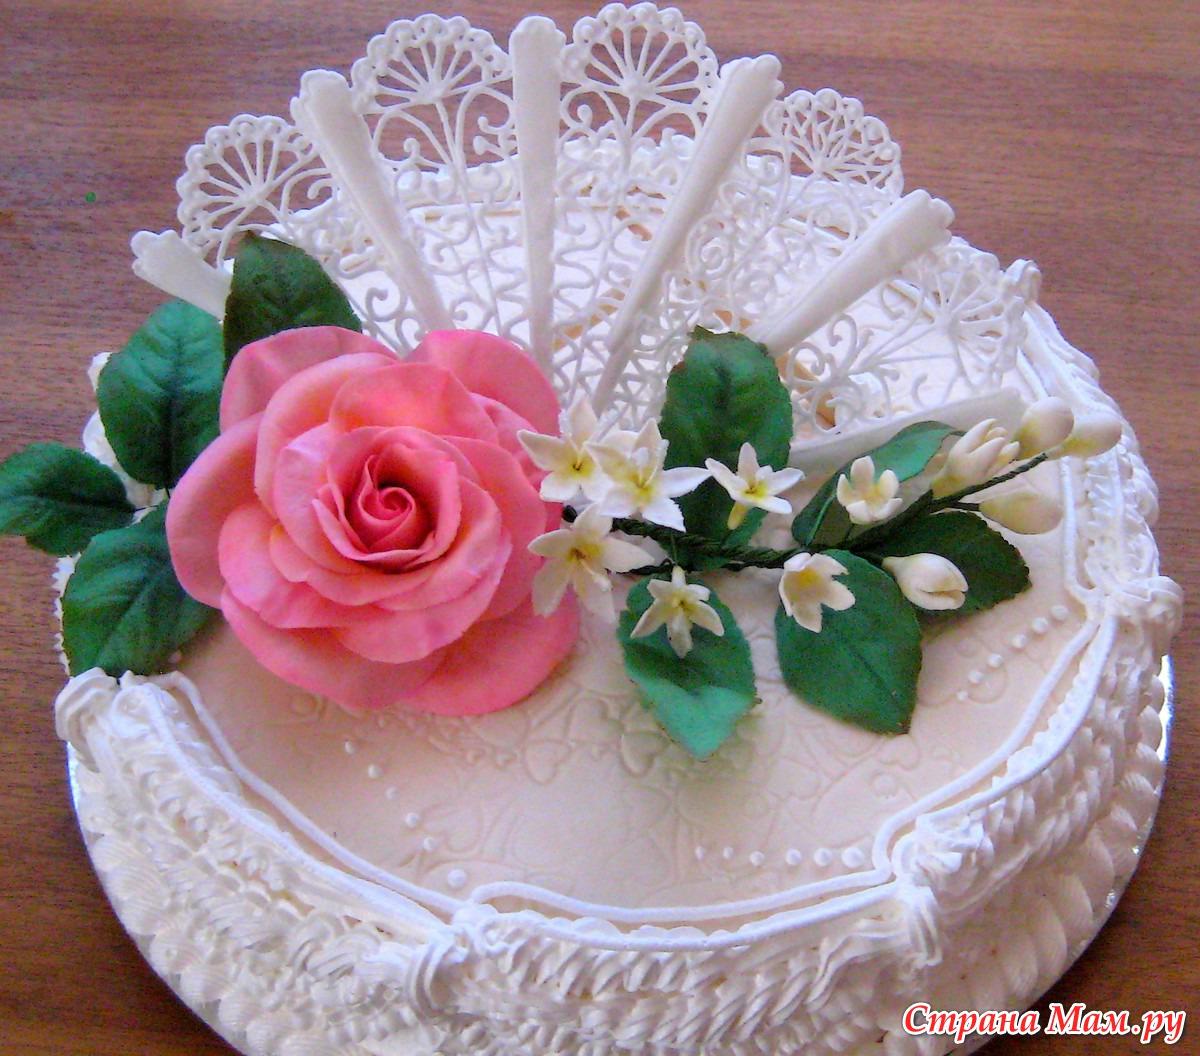 Объемная надпись на торте в домашних условиях